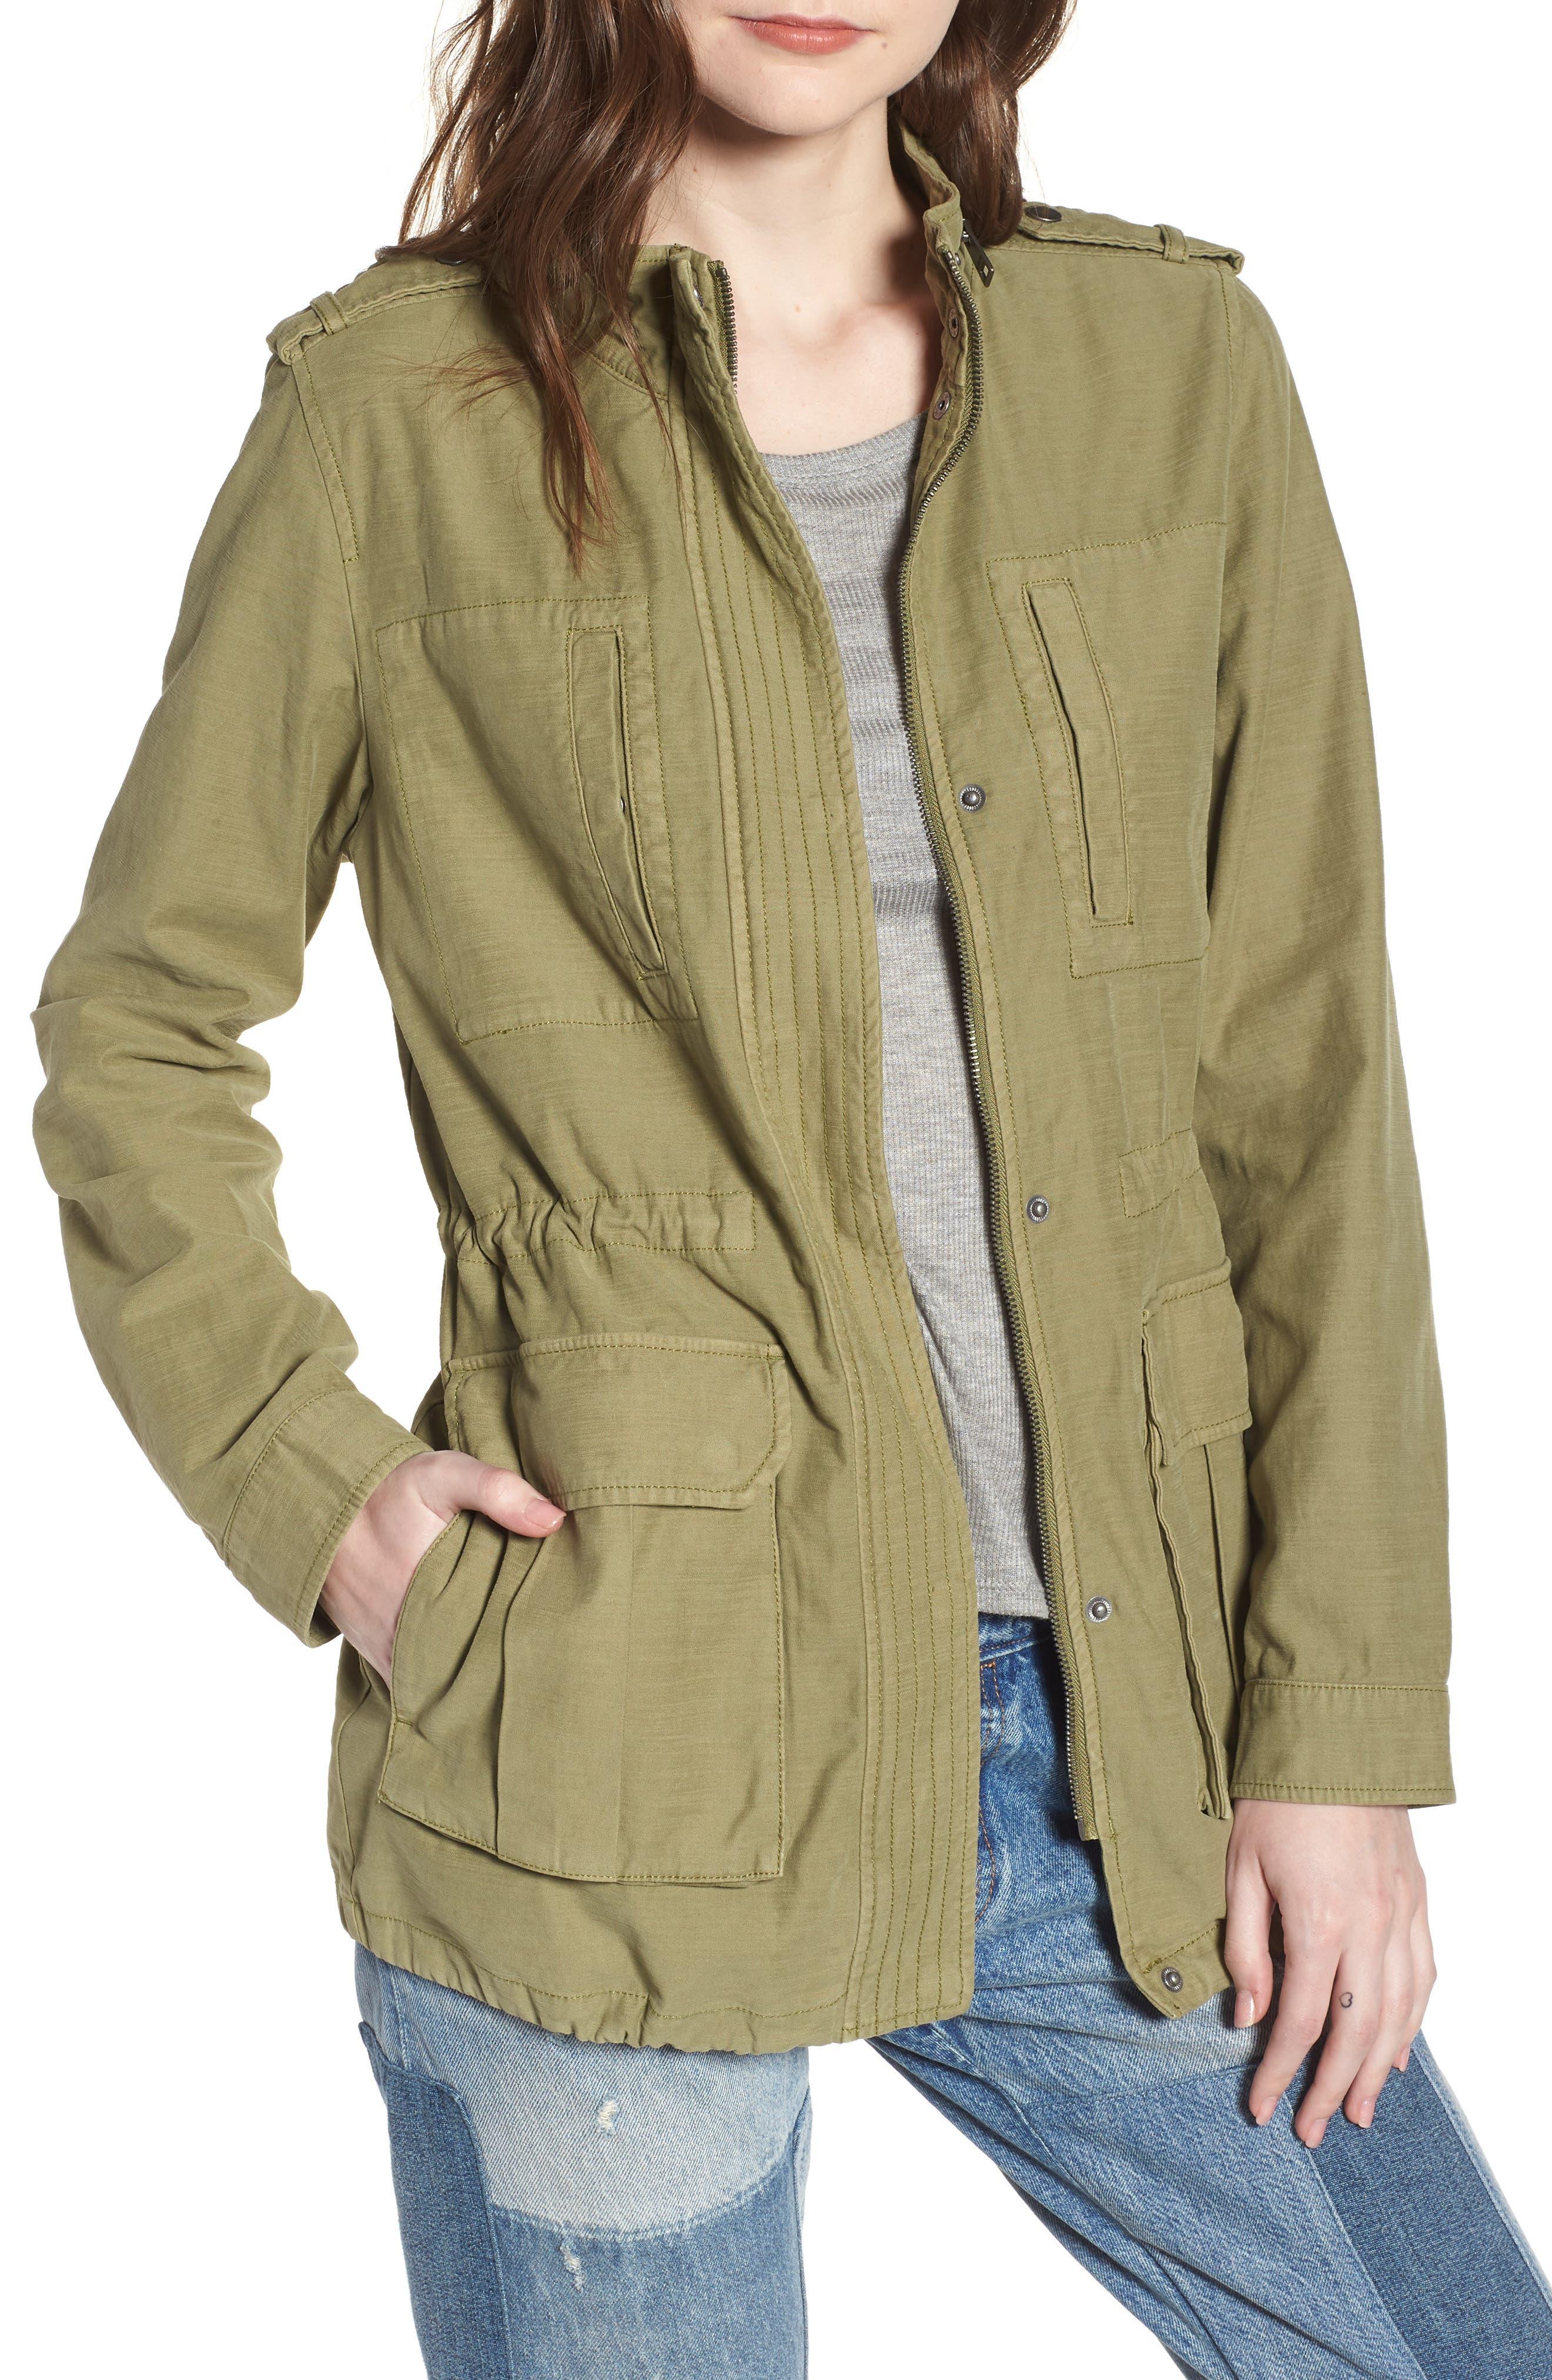 Alternate Image 1 Selected - Levi's® Cotton 4-Pocket Jacket (Regular & Petite)